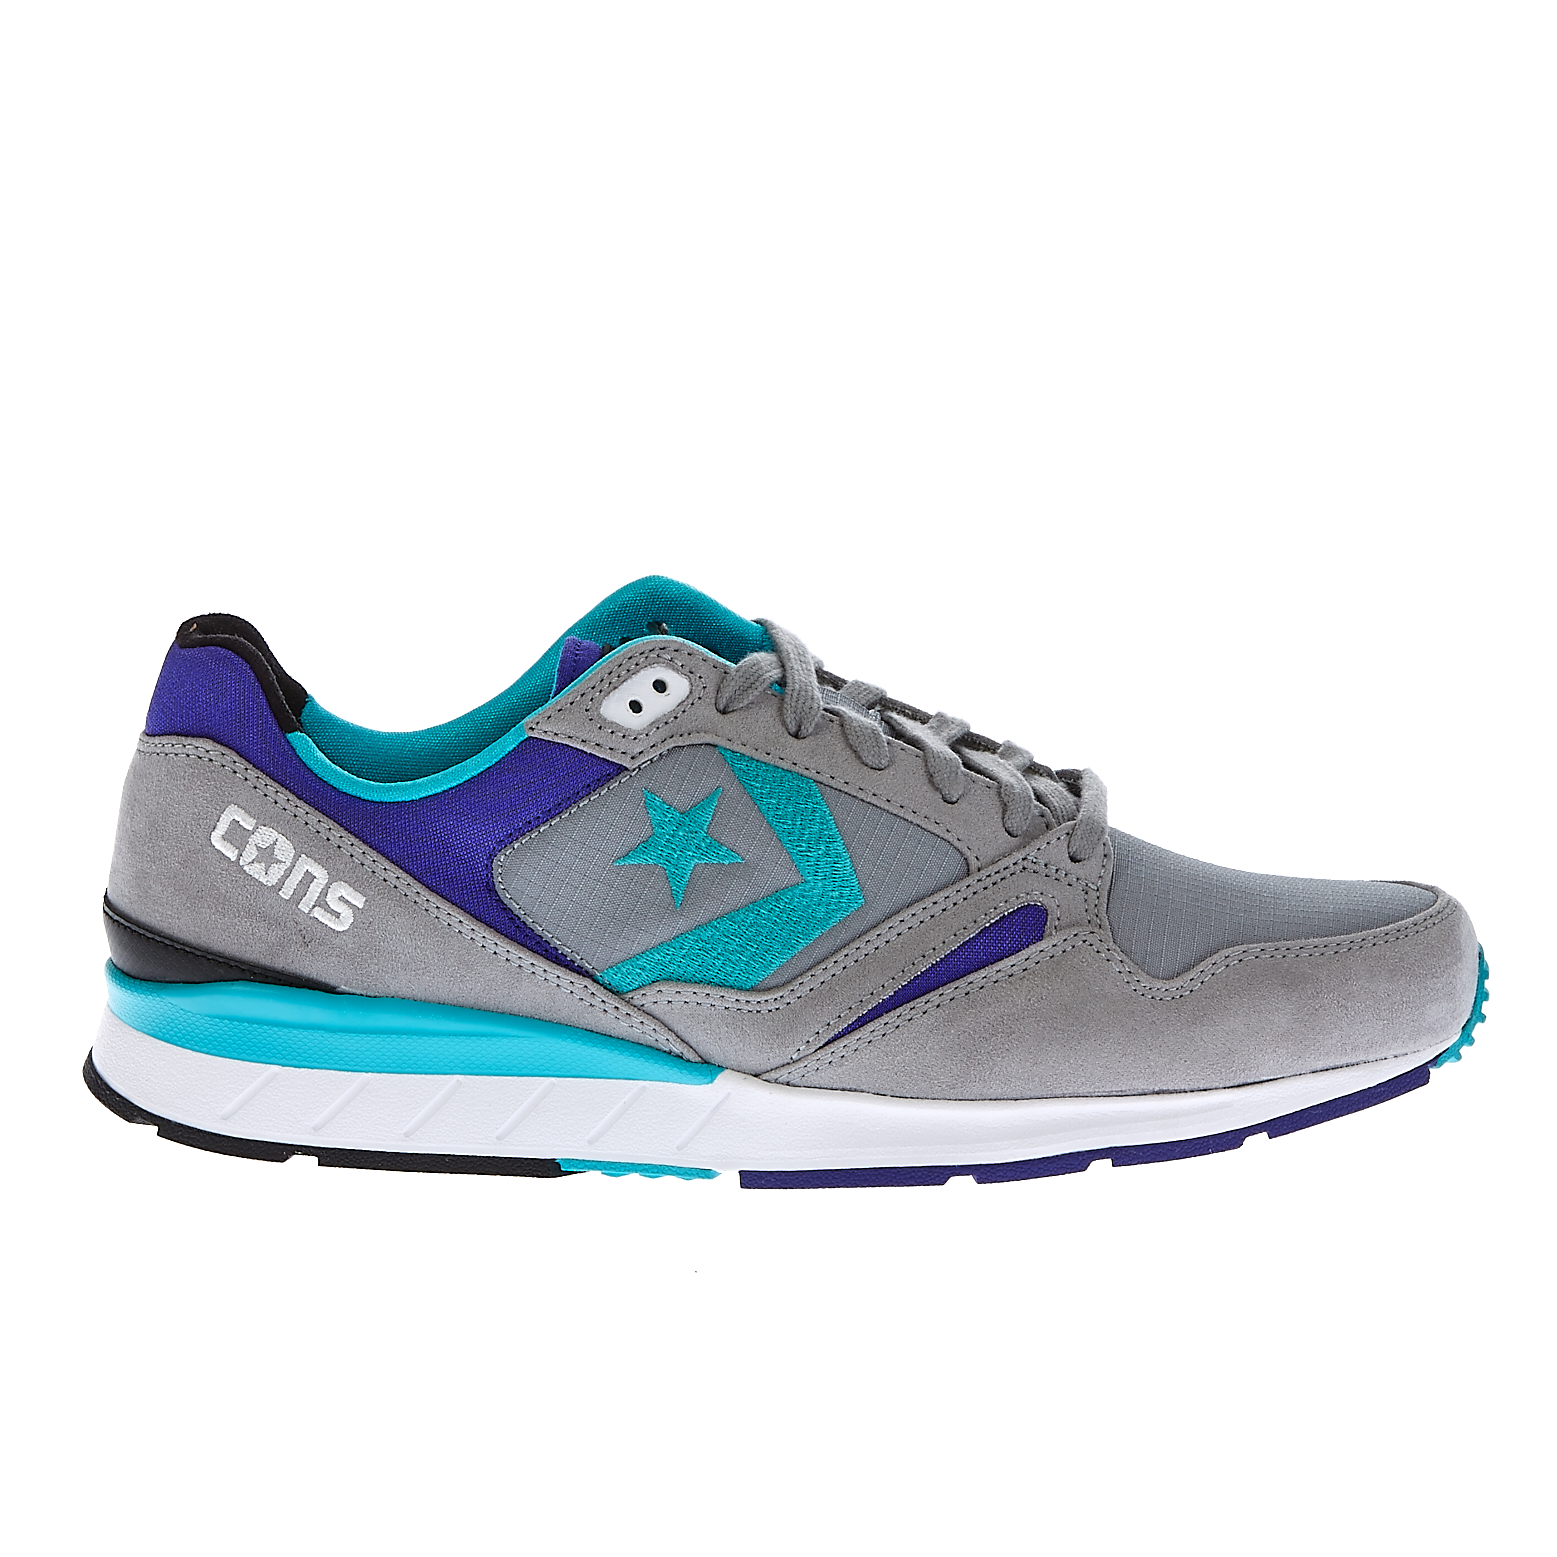 CONVERSE – Ανδρικά παπούτσια Wave Racer γκρι